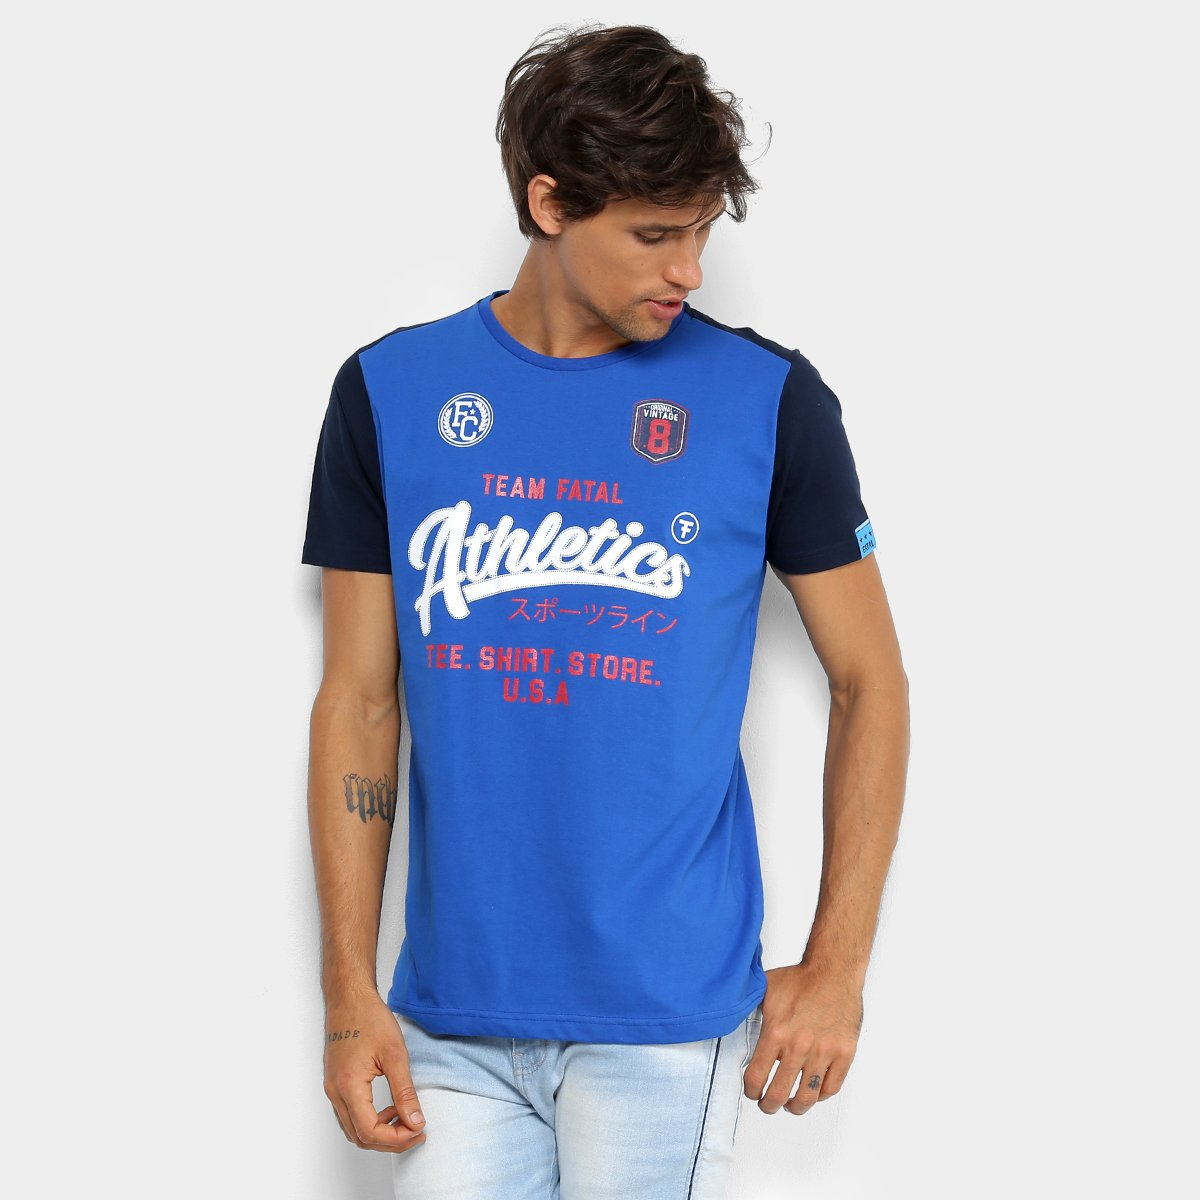 16a0462d222b1 Camiseta Estampada Fatal Manga Raglan Masculina - Azul Royal - Compre Agora